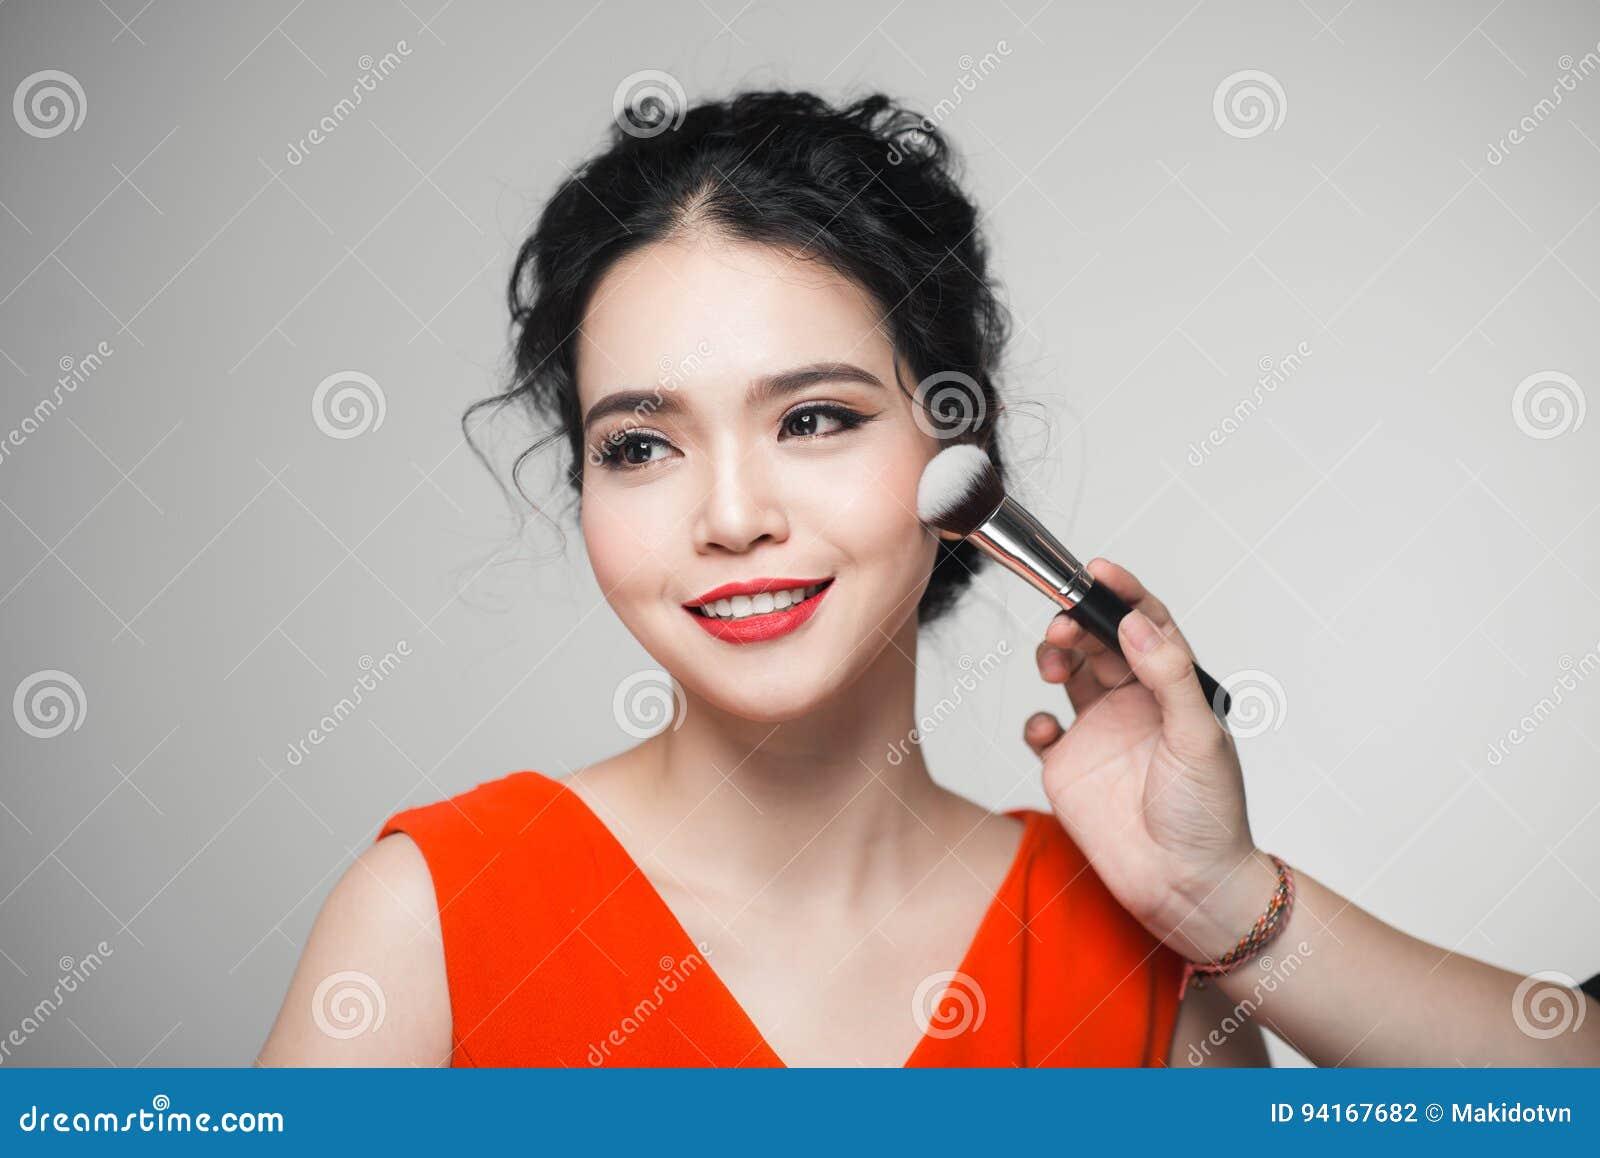 Congratulate, what asian young adult women photos